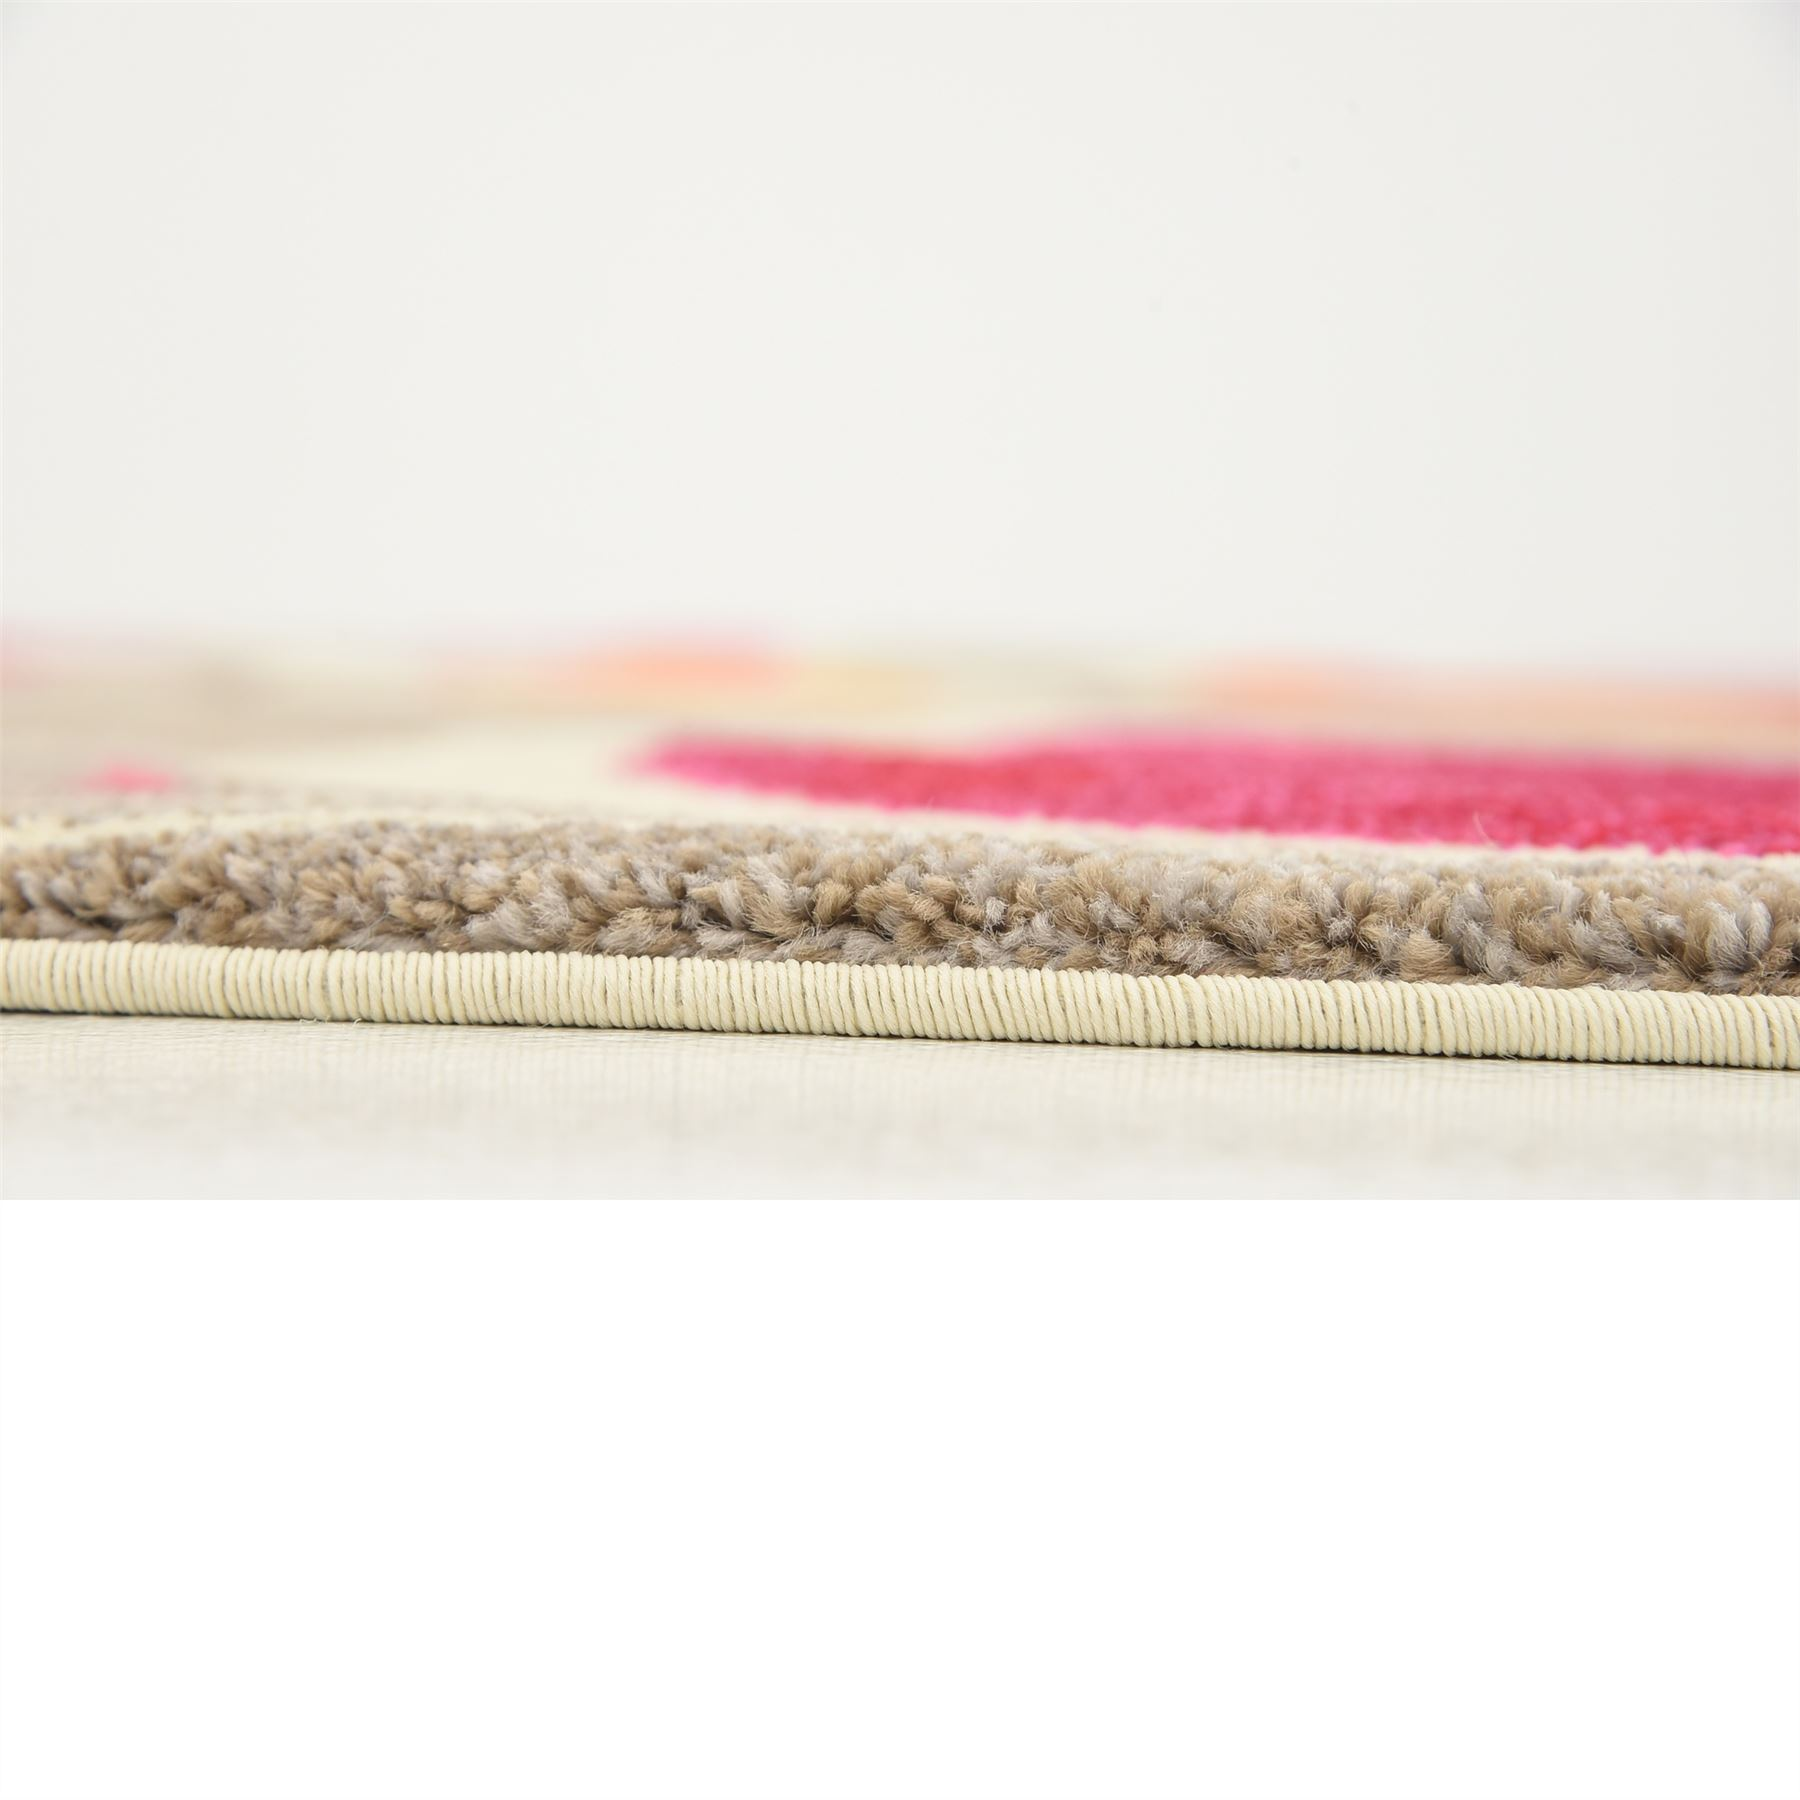 Modern Rug Orange: Modern Pink Area Rug Contemporary Orange Carpet Soft Large